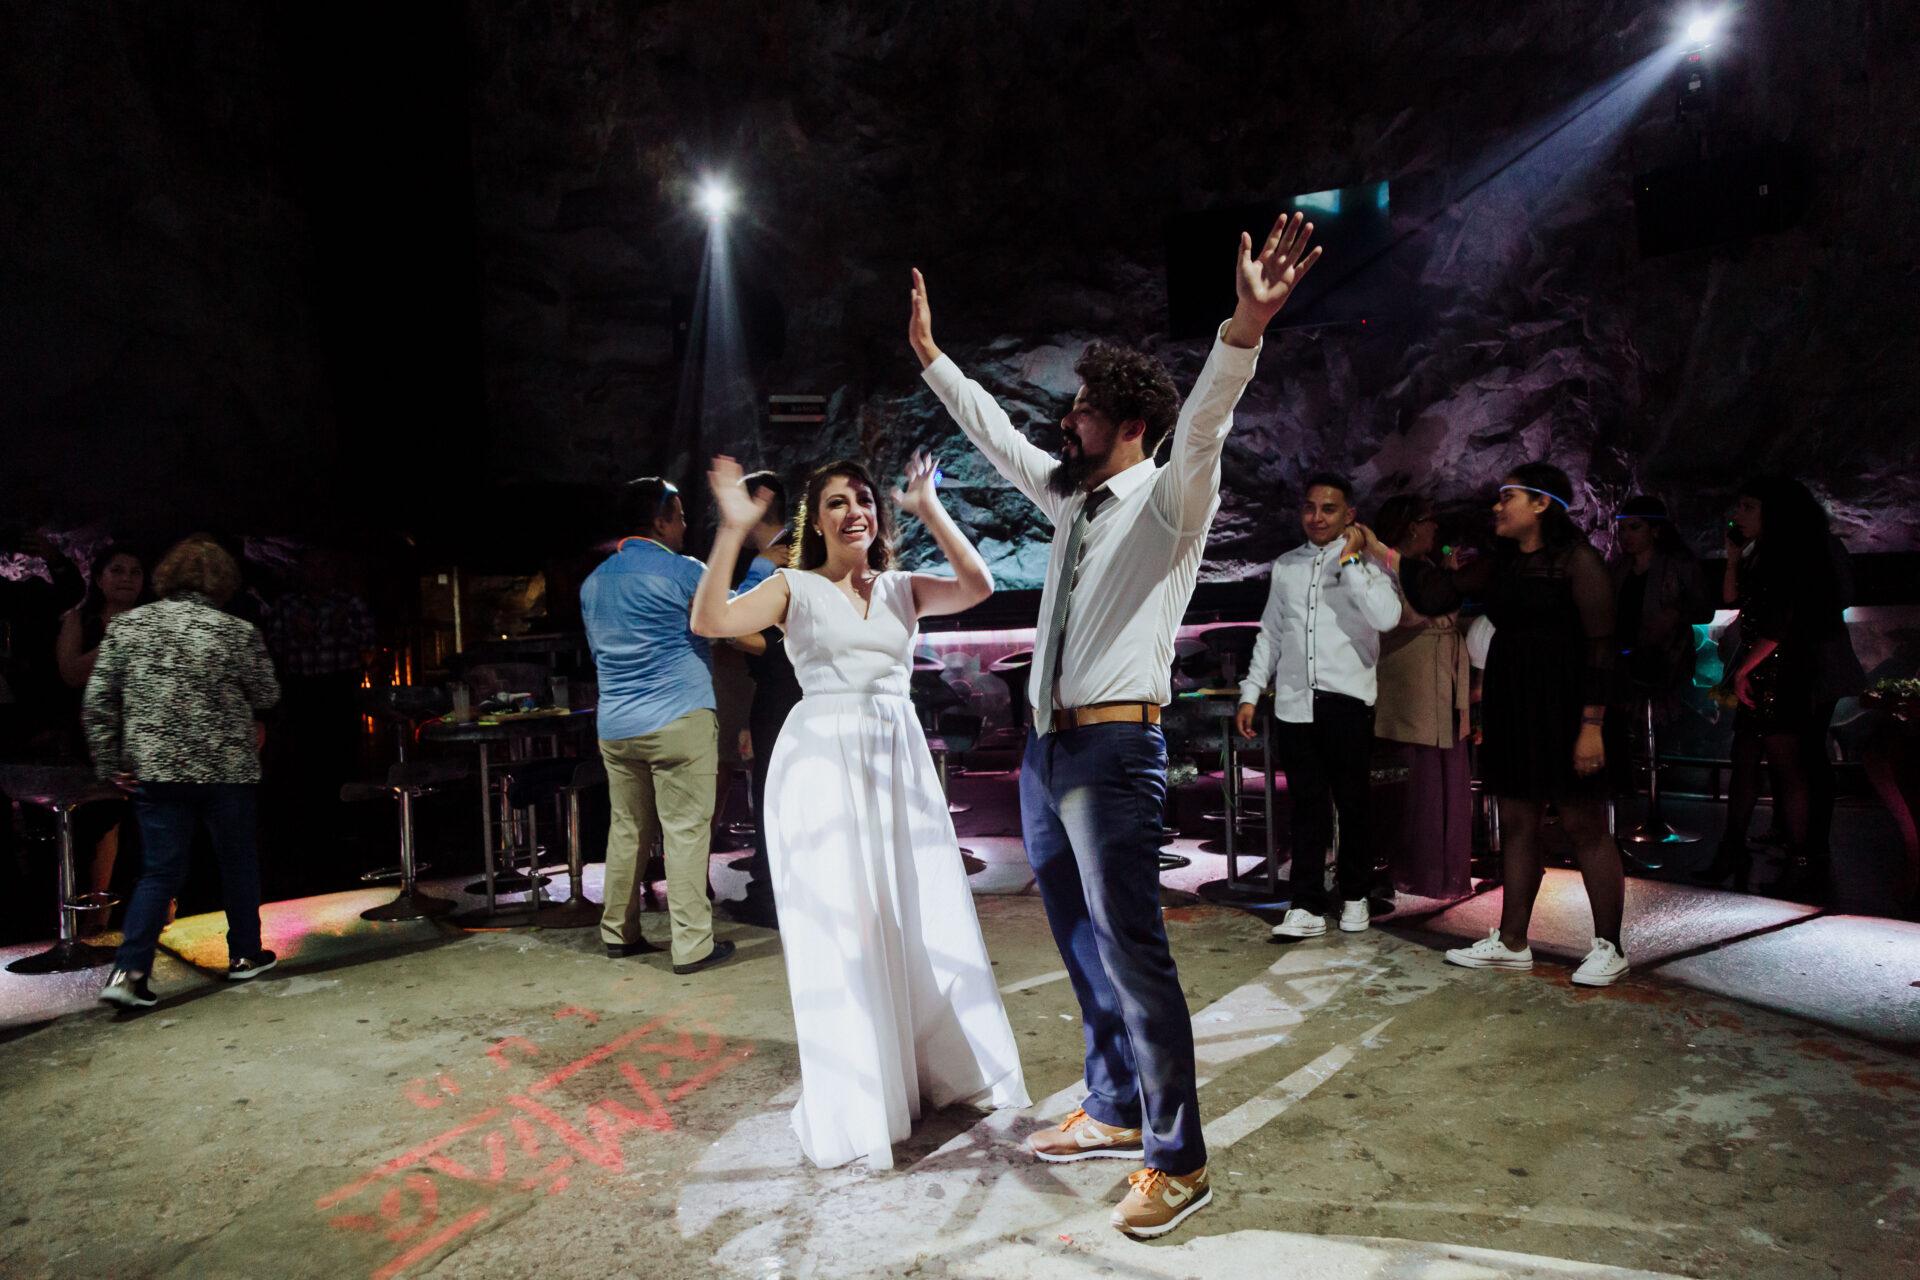 javier_noriega_fotografo_bodas_la_mina_club_zacatecas_wedding_photographer37